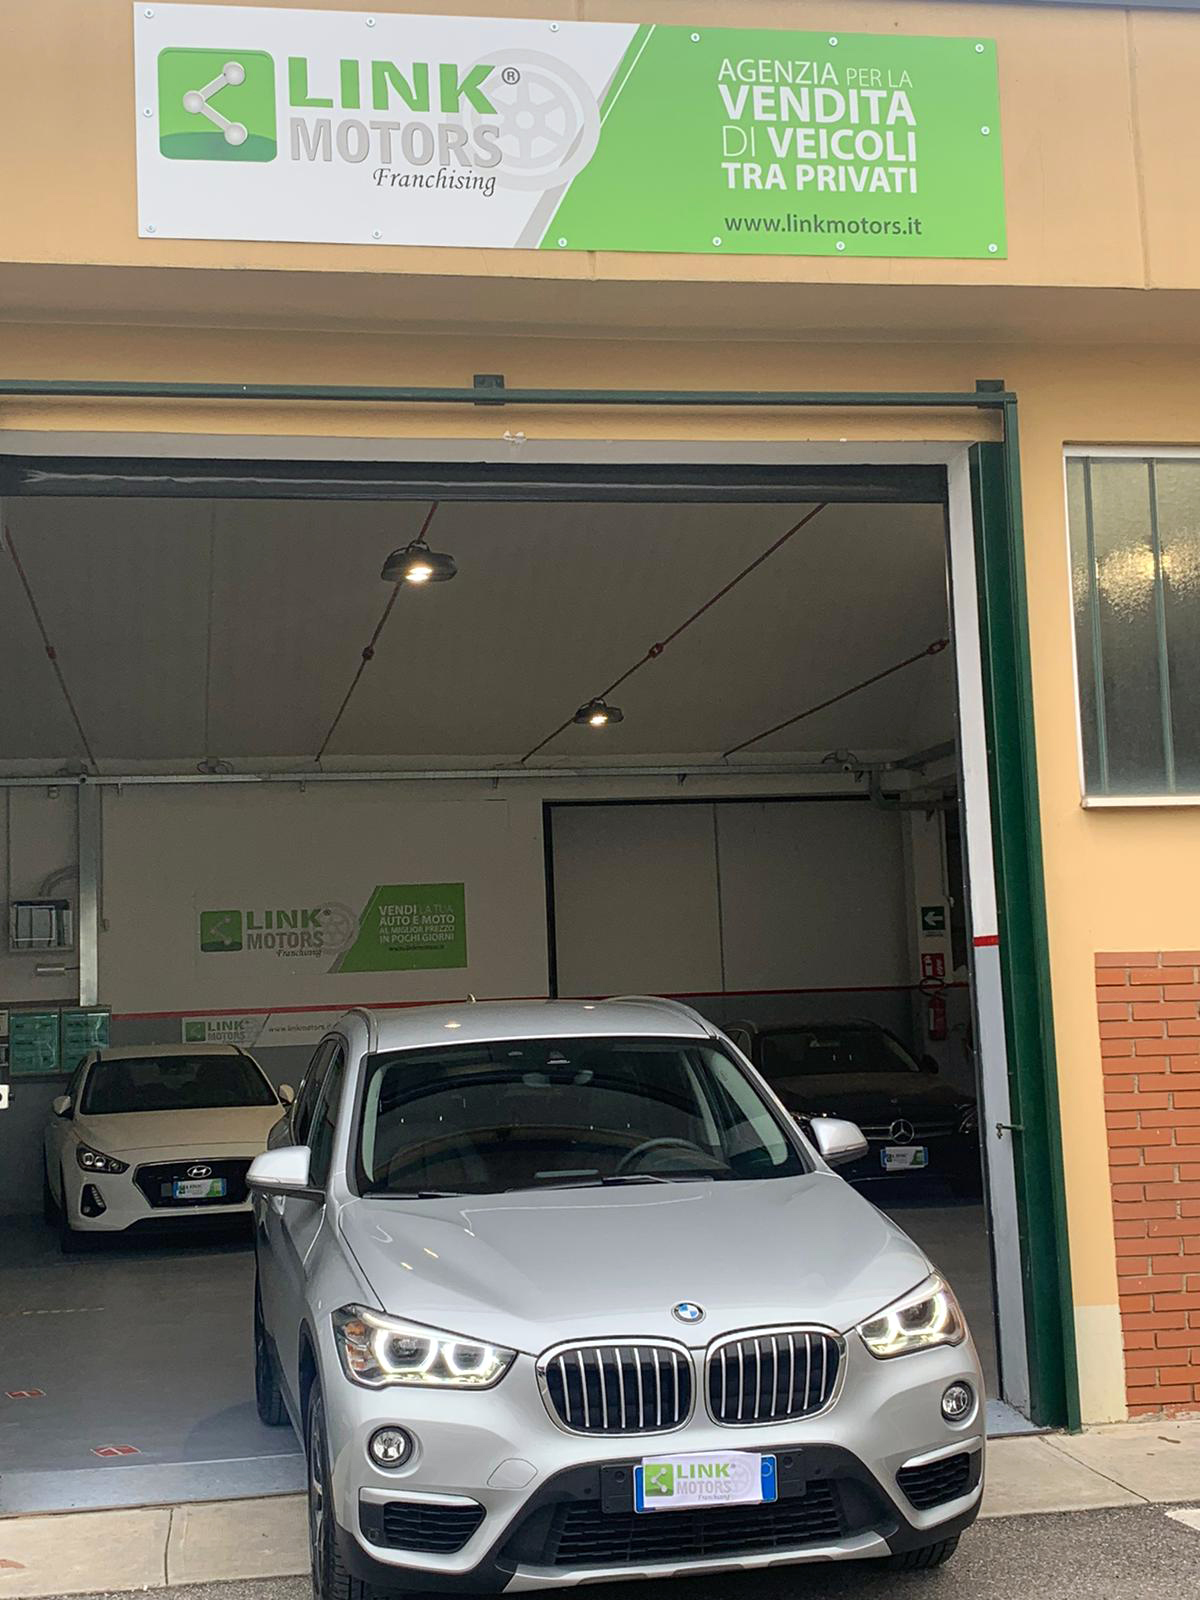 BMWSERIE 5 | Link Motors Franchising